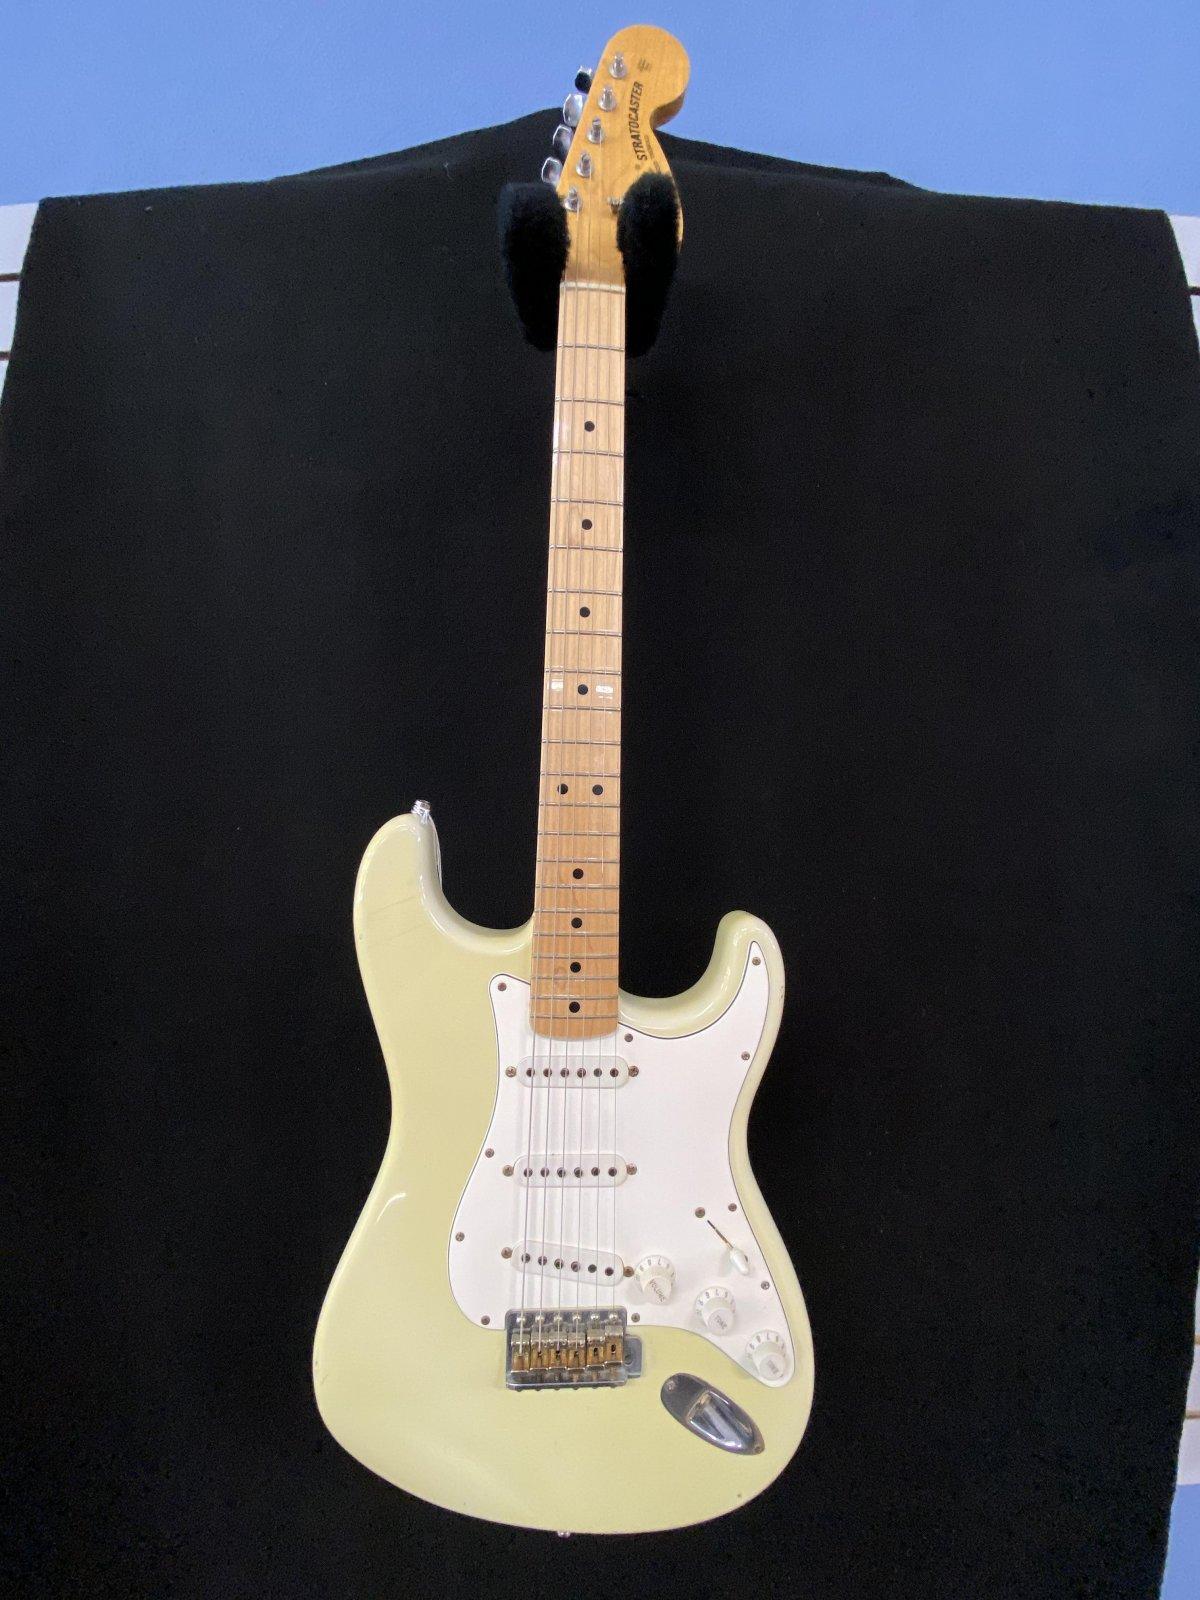 Fender Custom shop 69' Relic Stratocaster